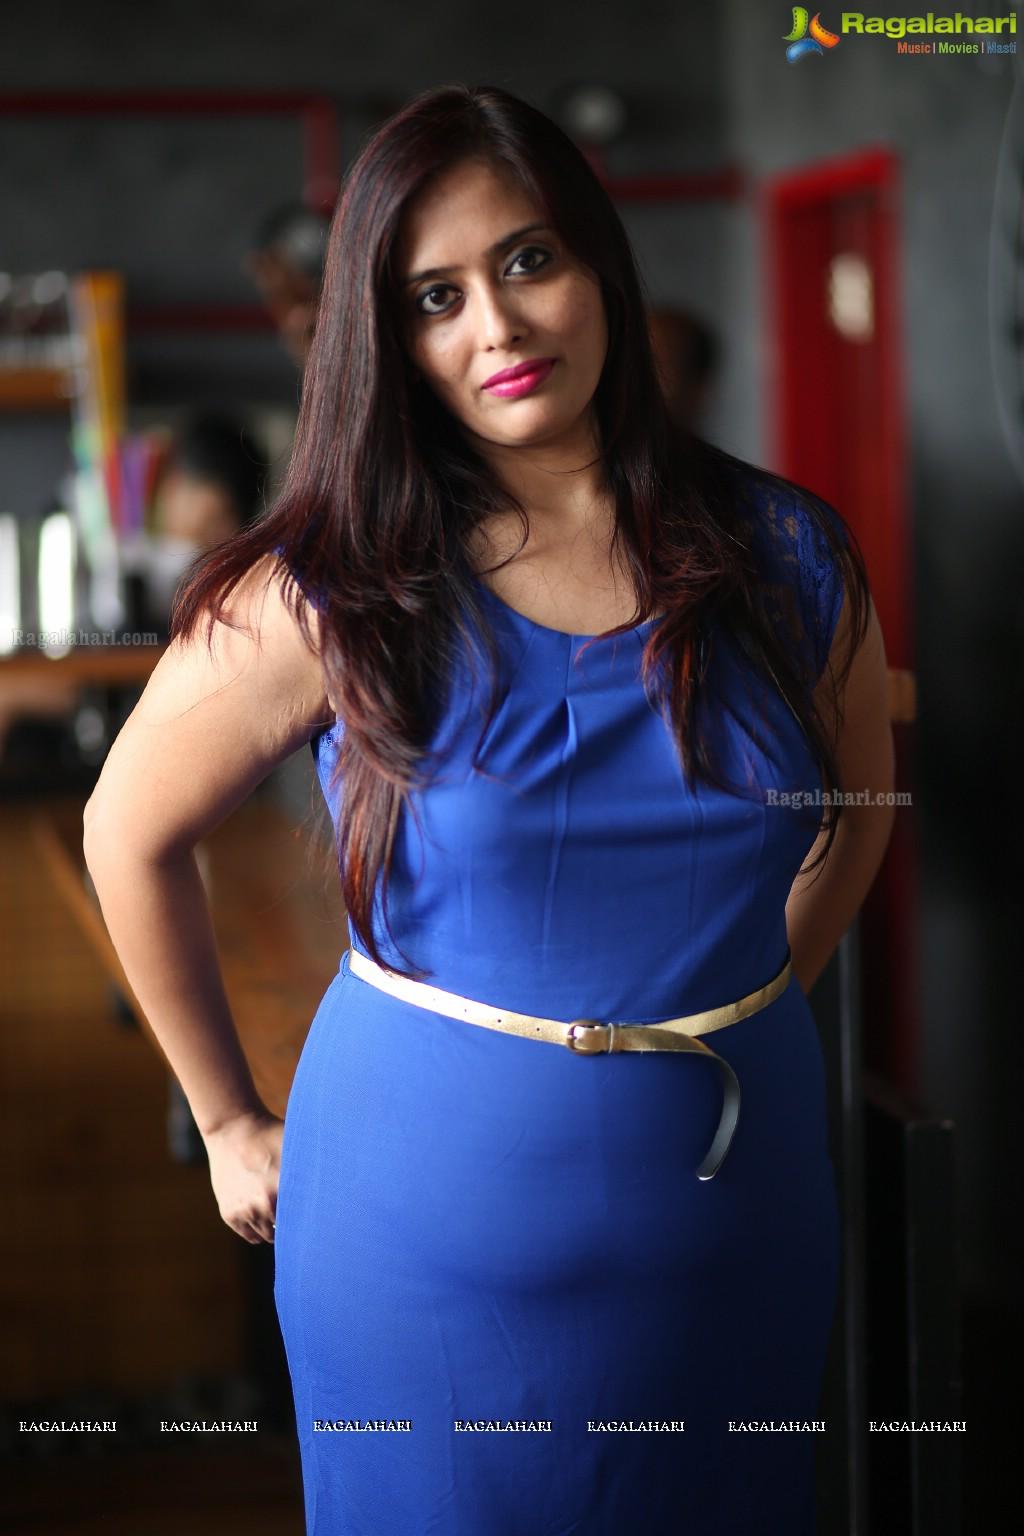 Ragalahari coverage queens lounge pre christmas bash - Miton cucine forum ...